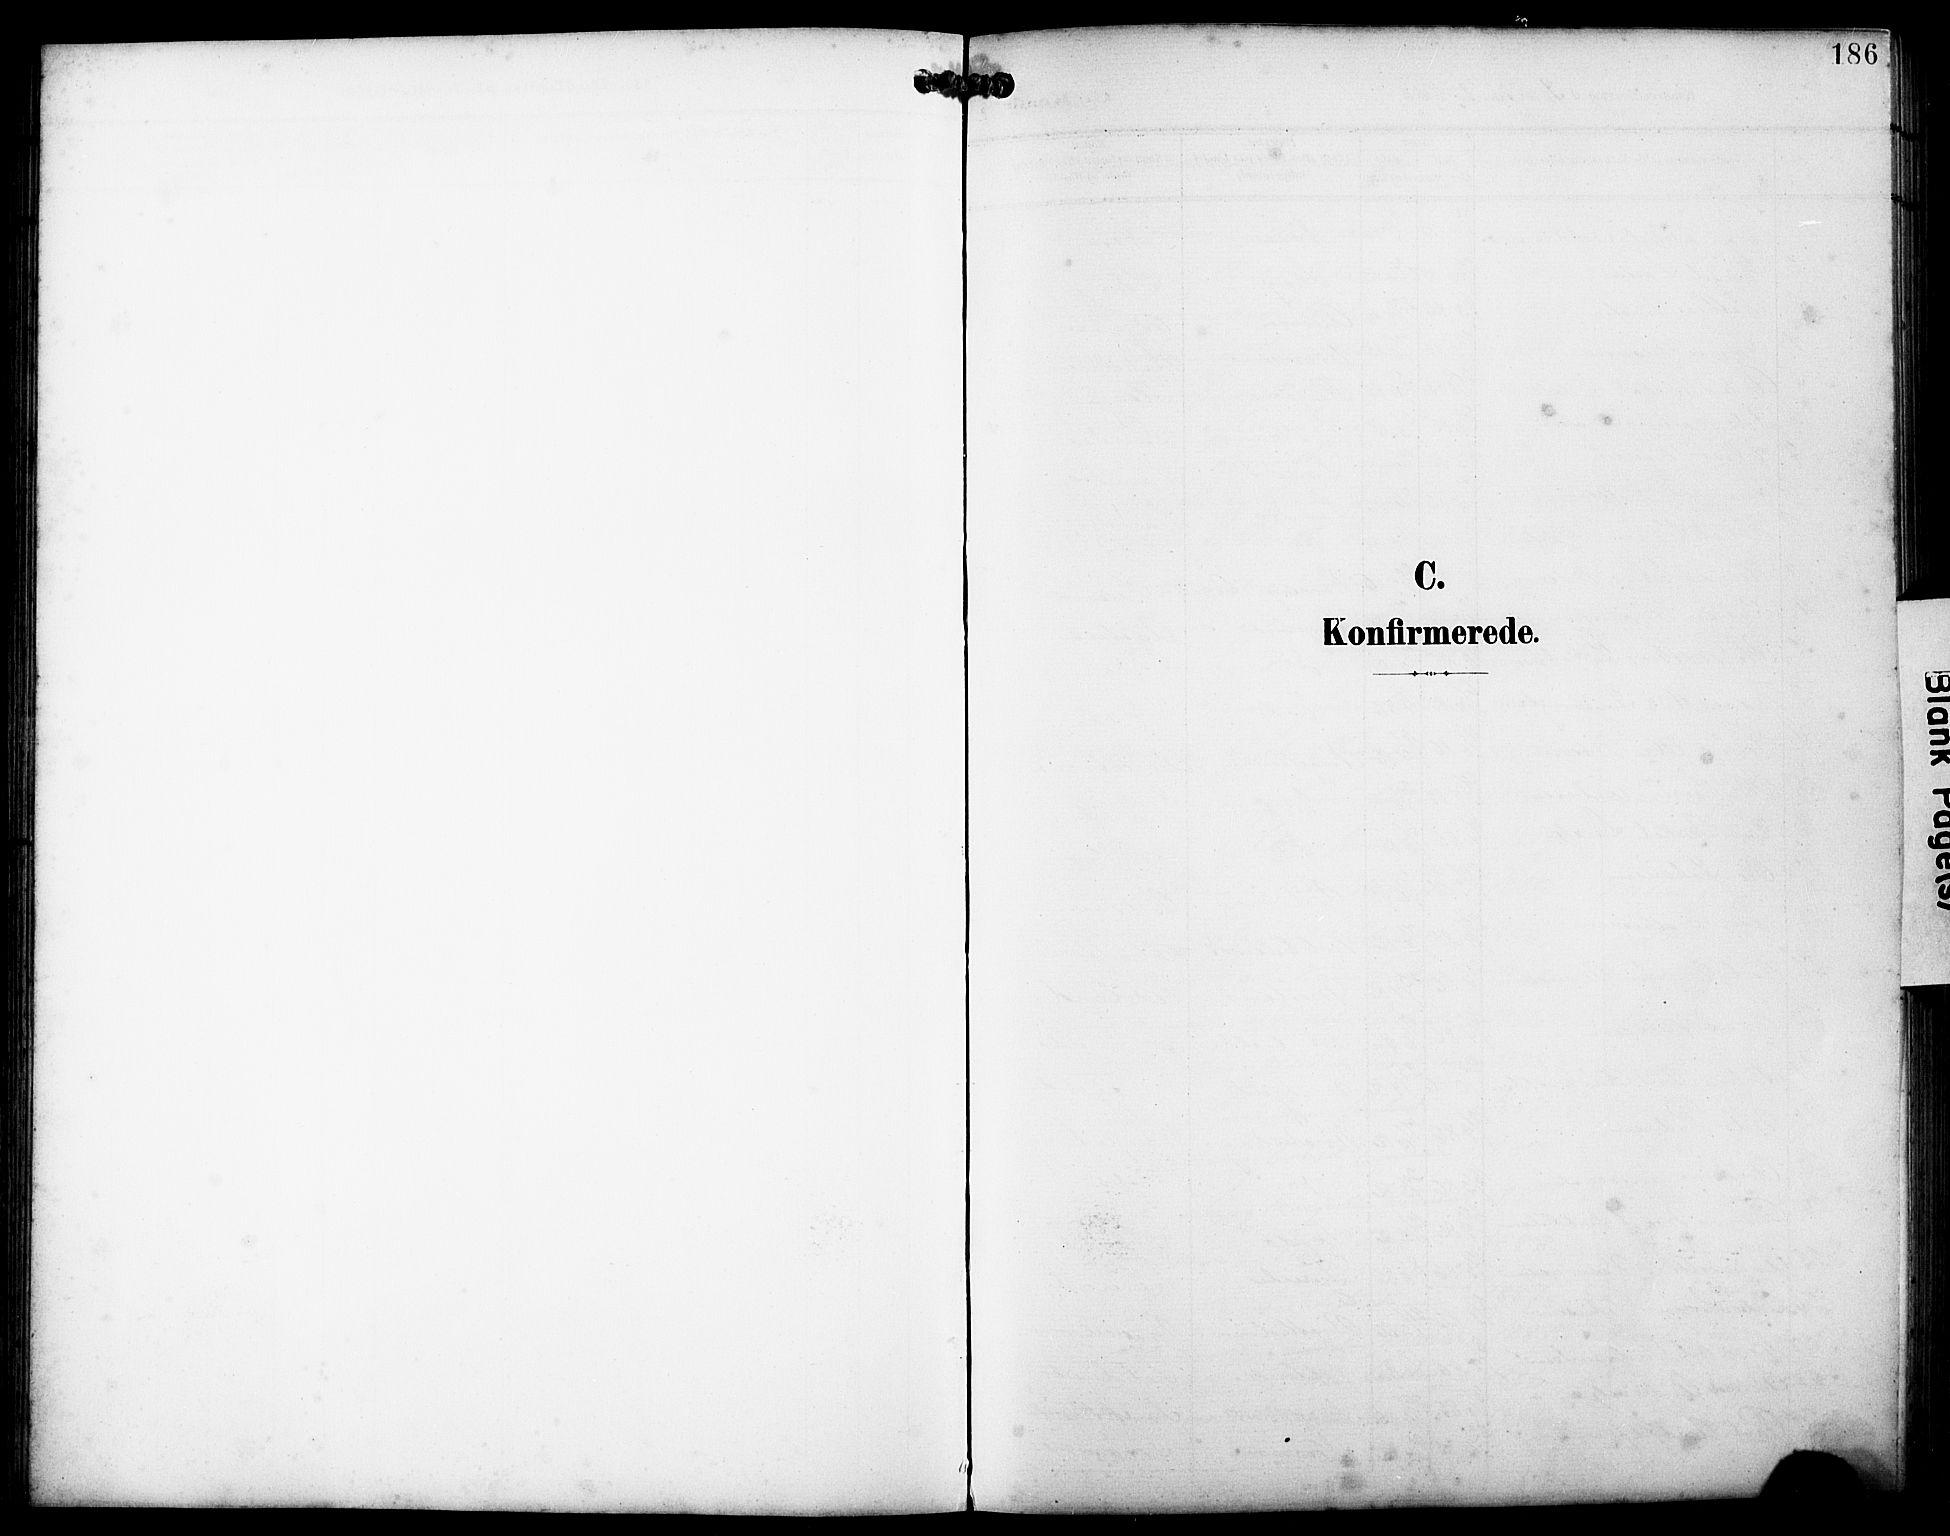 SAB, Fjell sokneprestembete, H/Hab: Klokkerbok nr. A 5, 1899-1918, s. 186